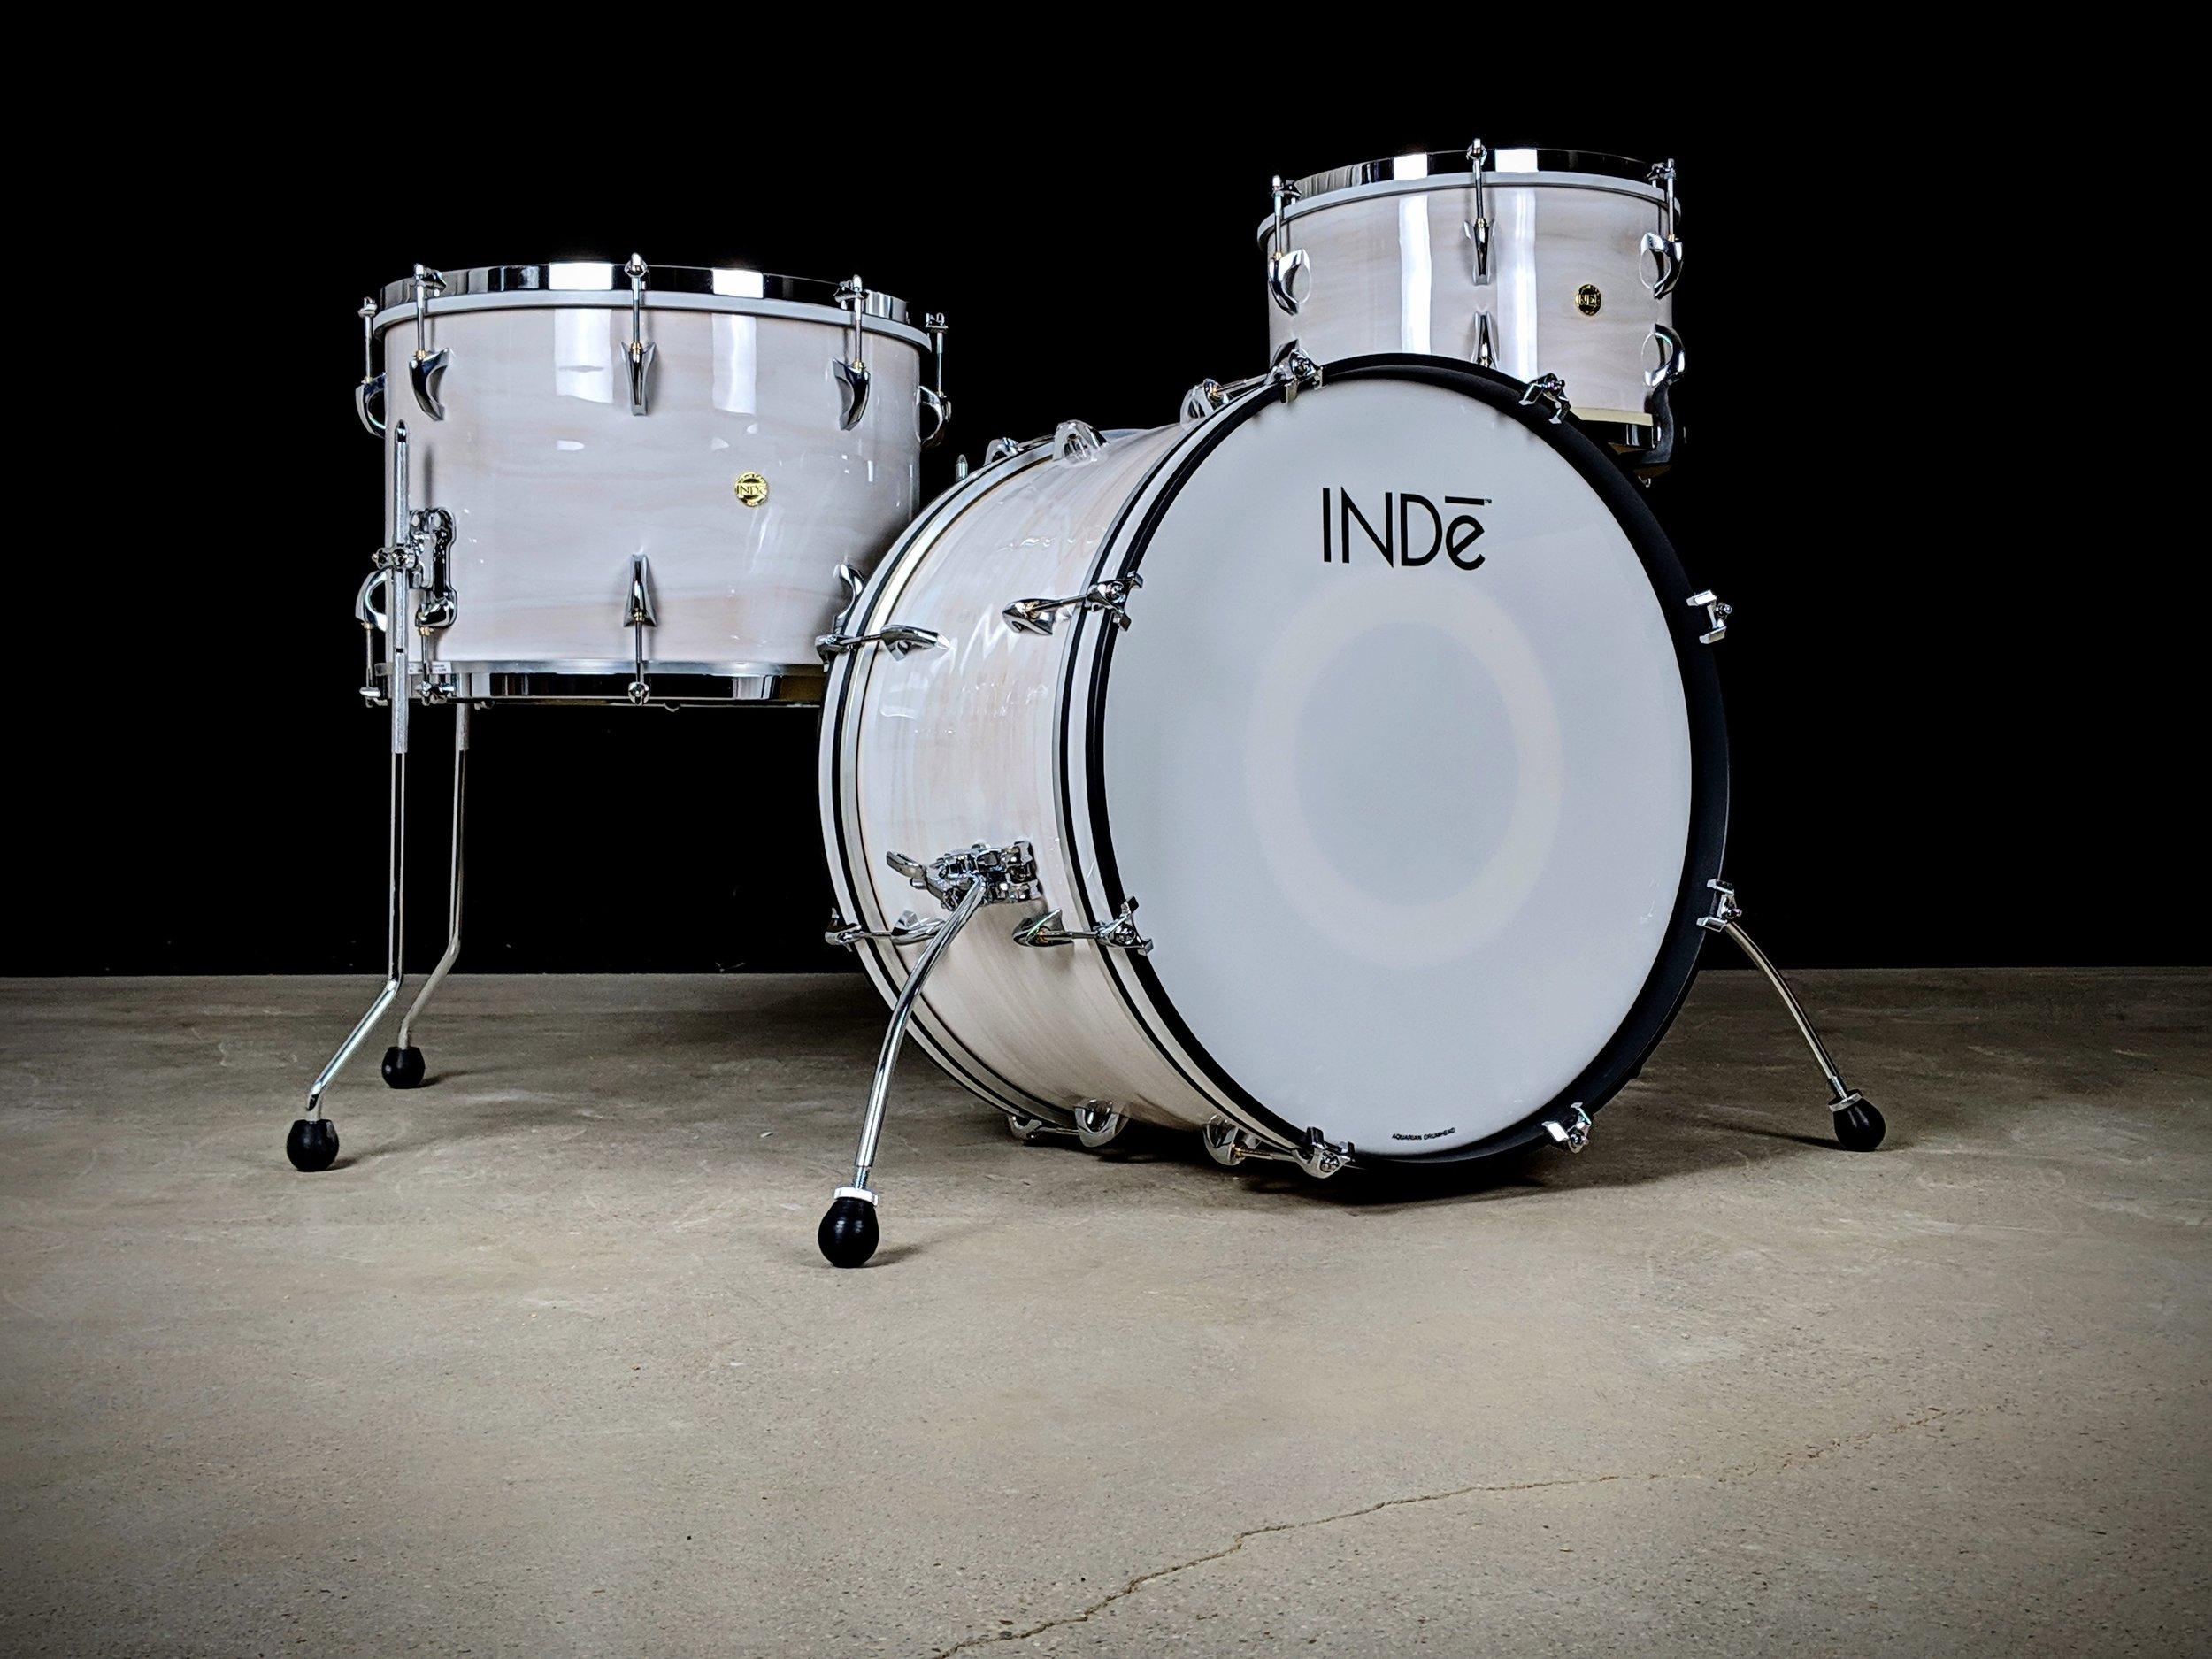 RESoArmor Swatches — INDe Drum Lab